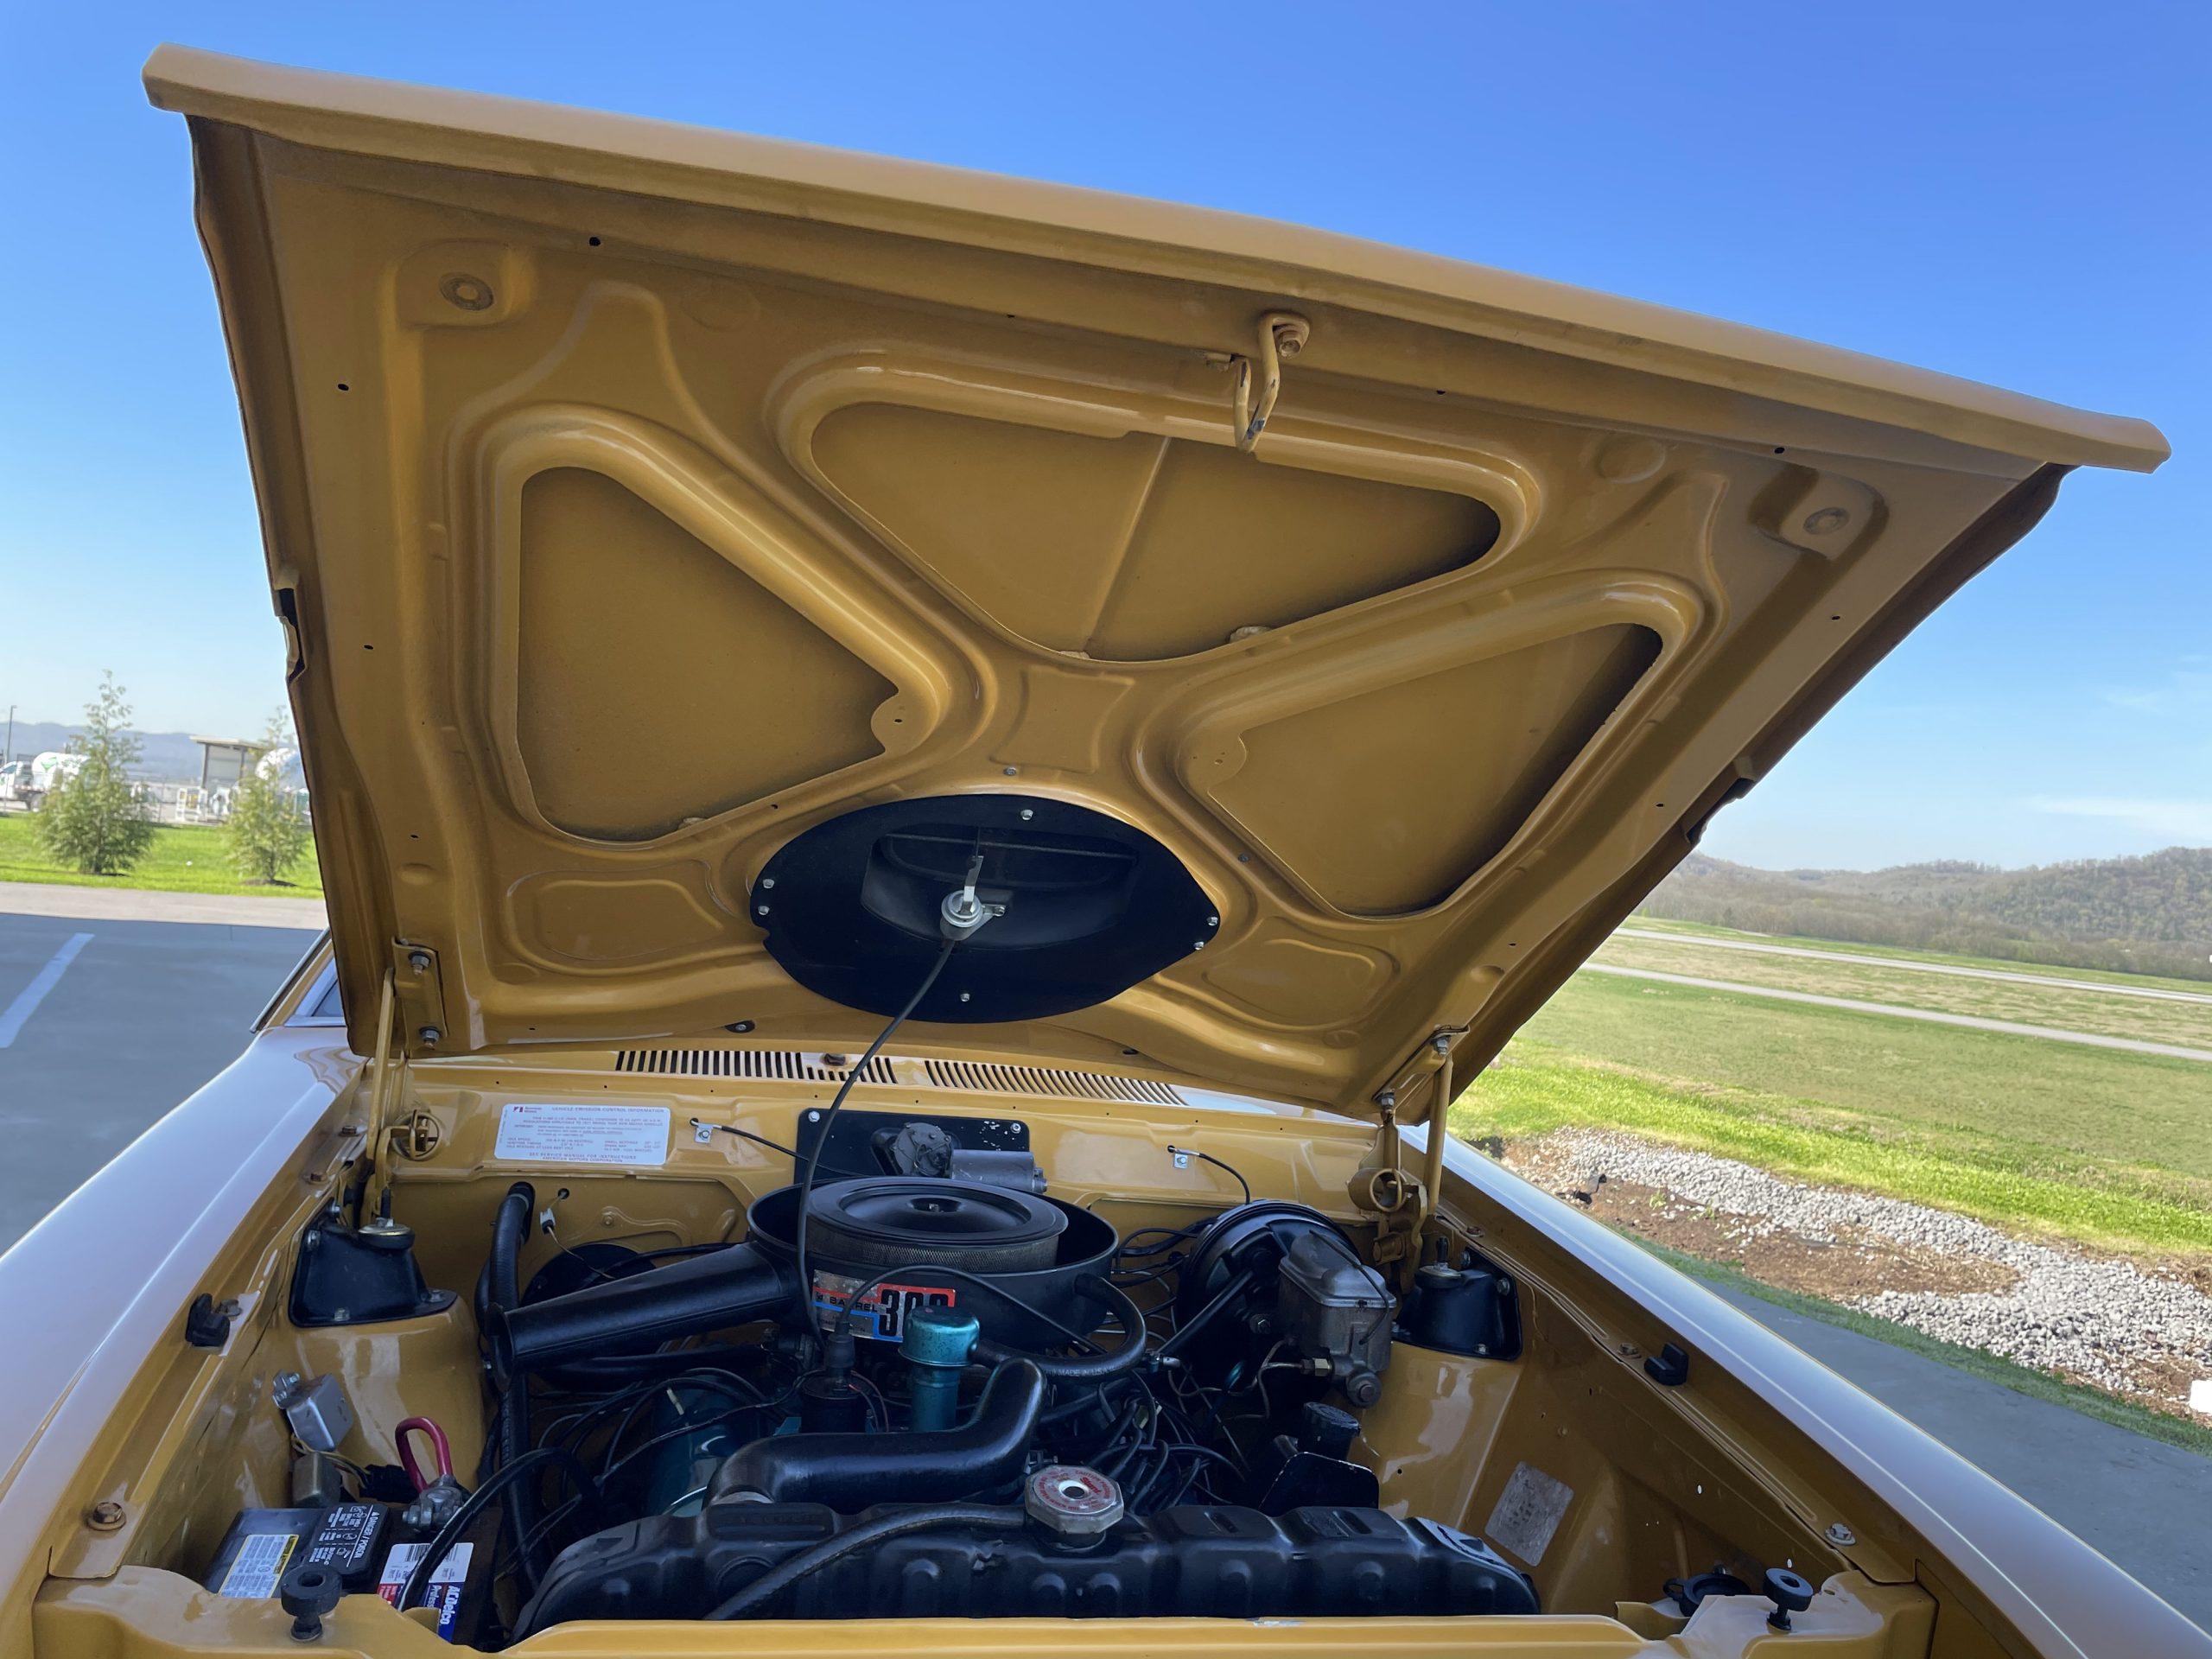 1971-AMC-Hornet-SC hood up